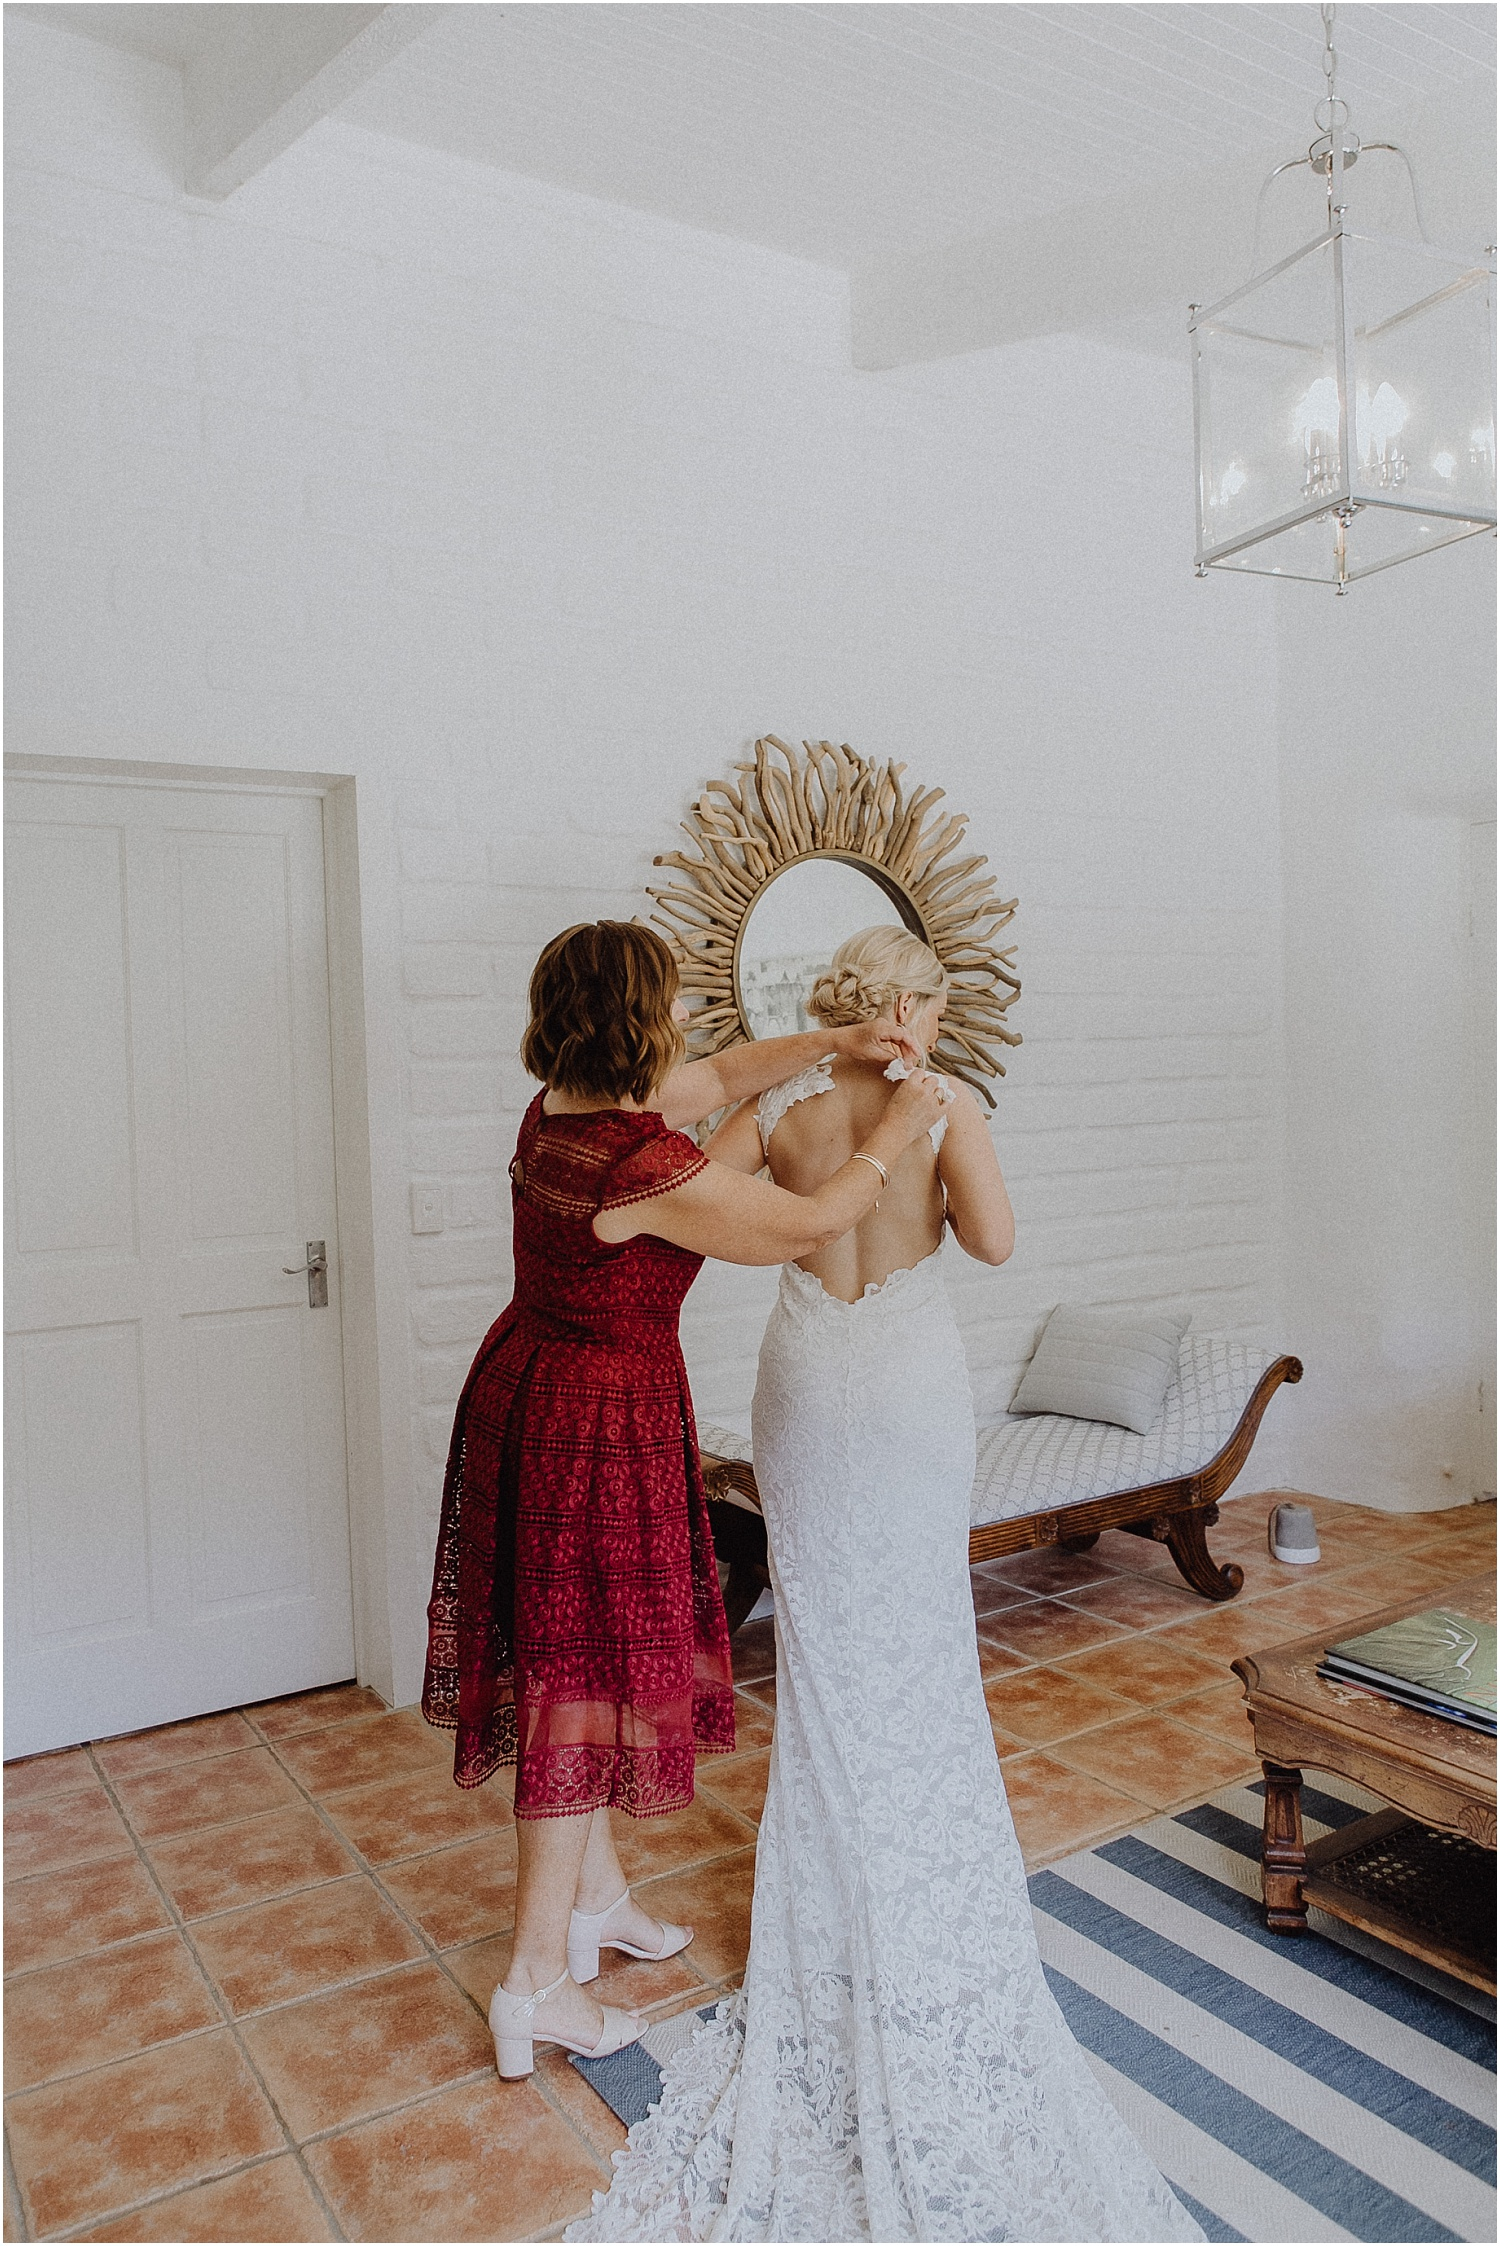 Nicolle and Damien's tipi wedding at the Flinders Yacht Club on the Mornington Peninsula._0045.jpg